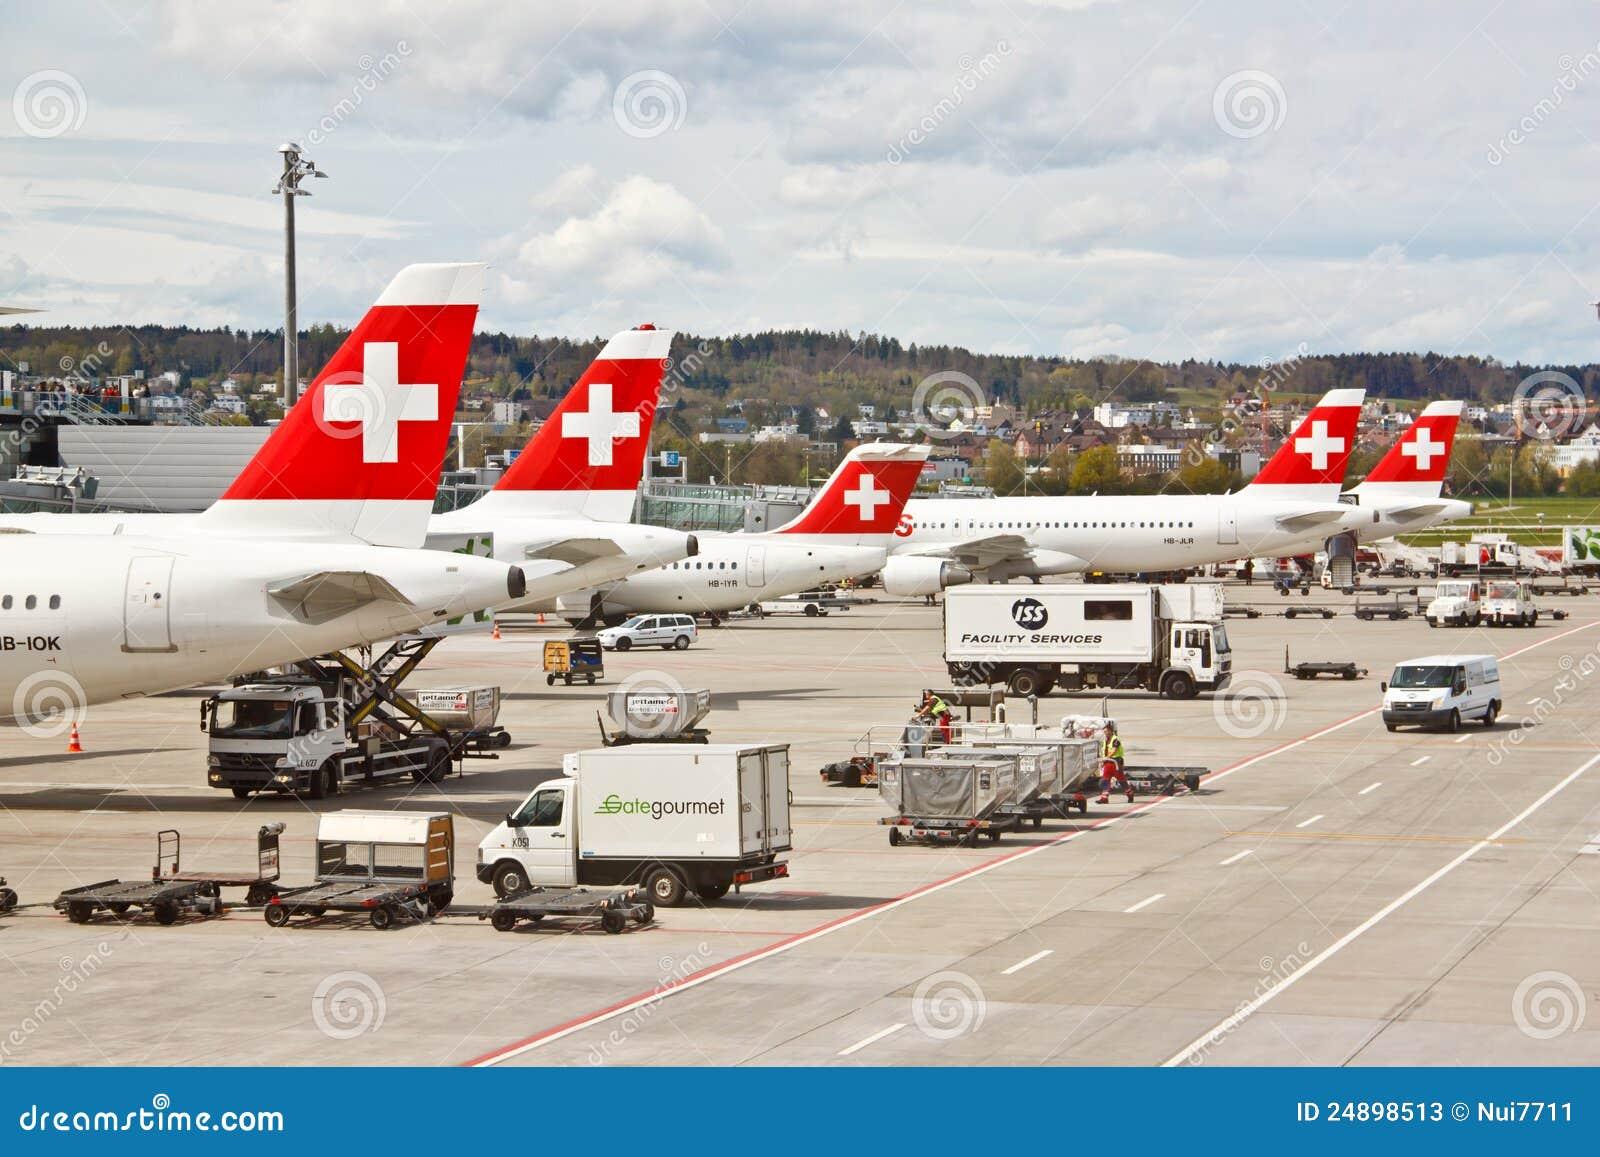 SWISS s air crafts at Zurich airport 1